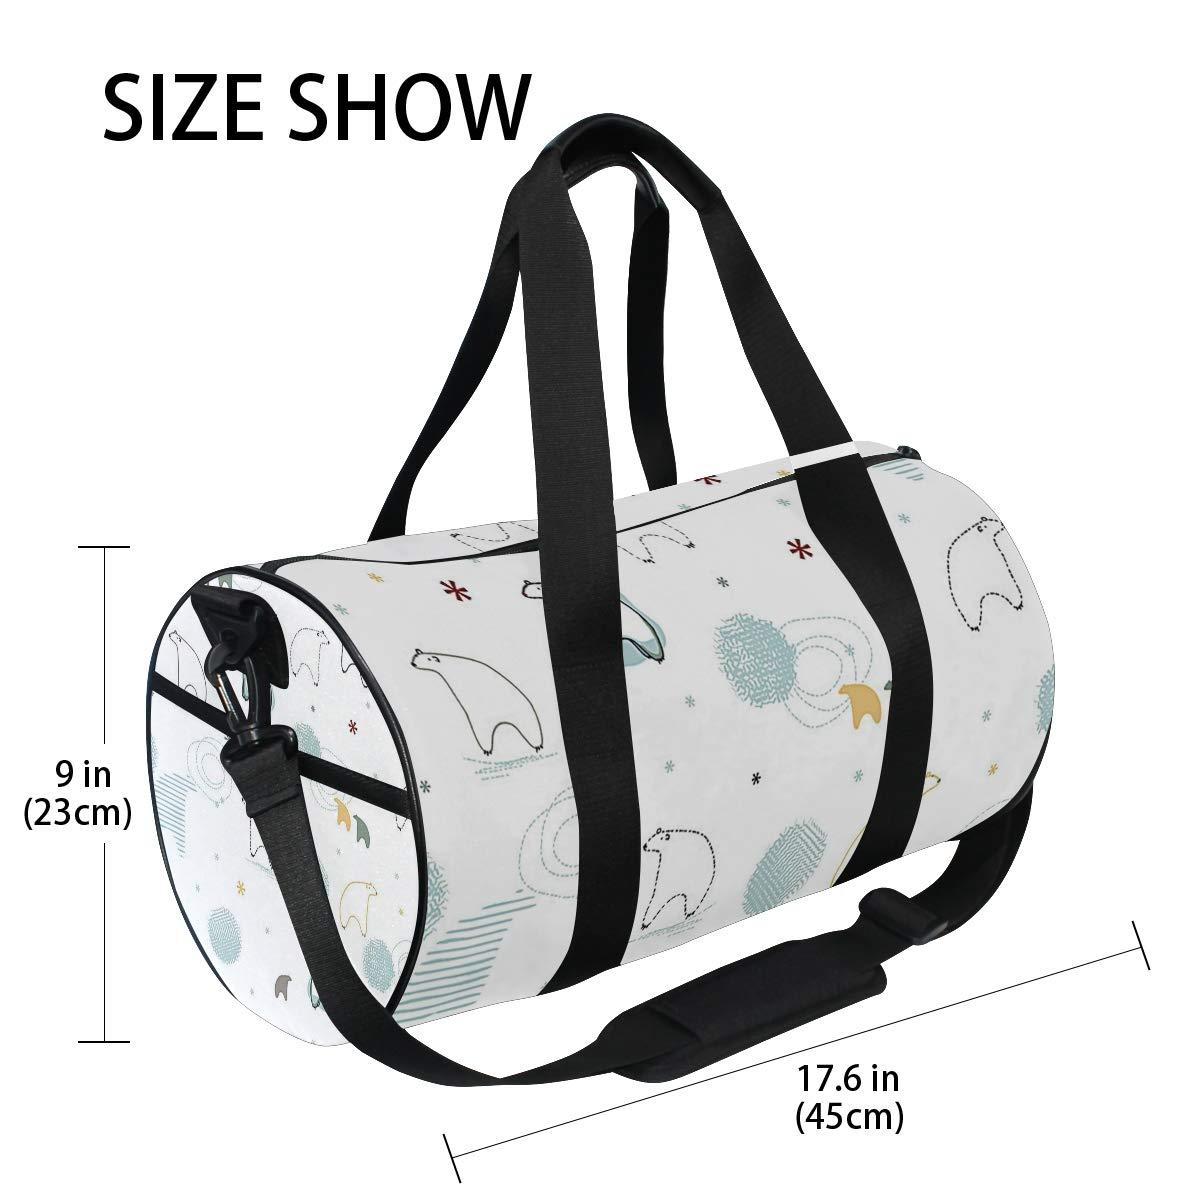 Sports Gym Duffel Barrel Bag Kawaii Polar Bear Save Travel Luggage Handbag for Men Women